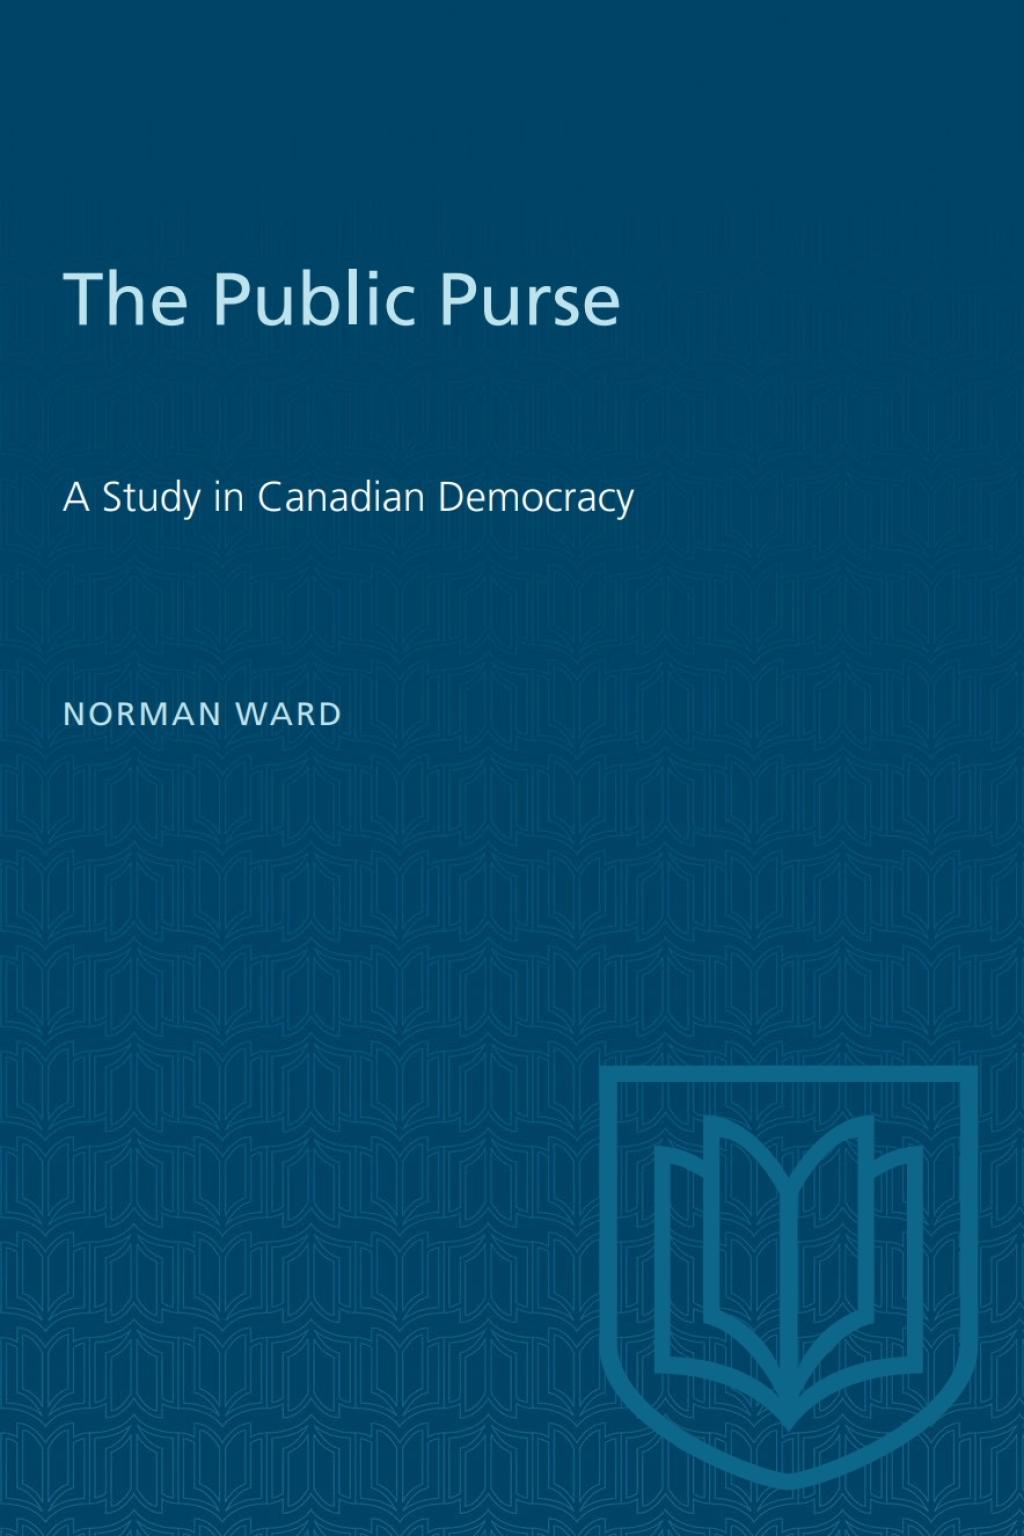 The Public Purse (eBook) (9781487574413) photo